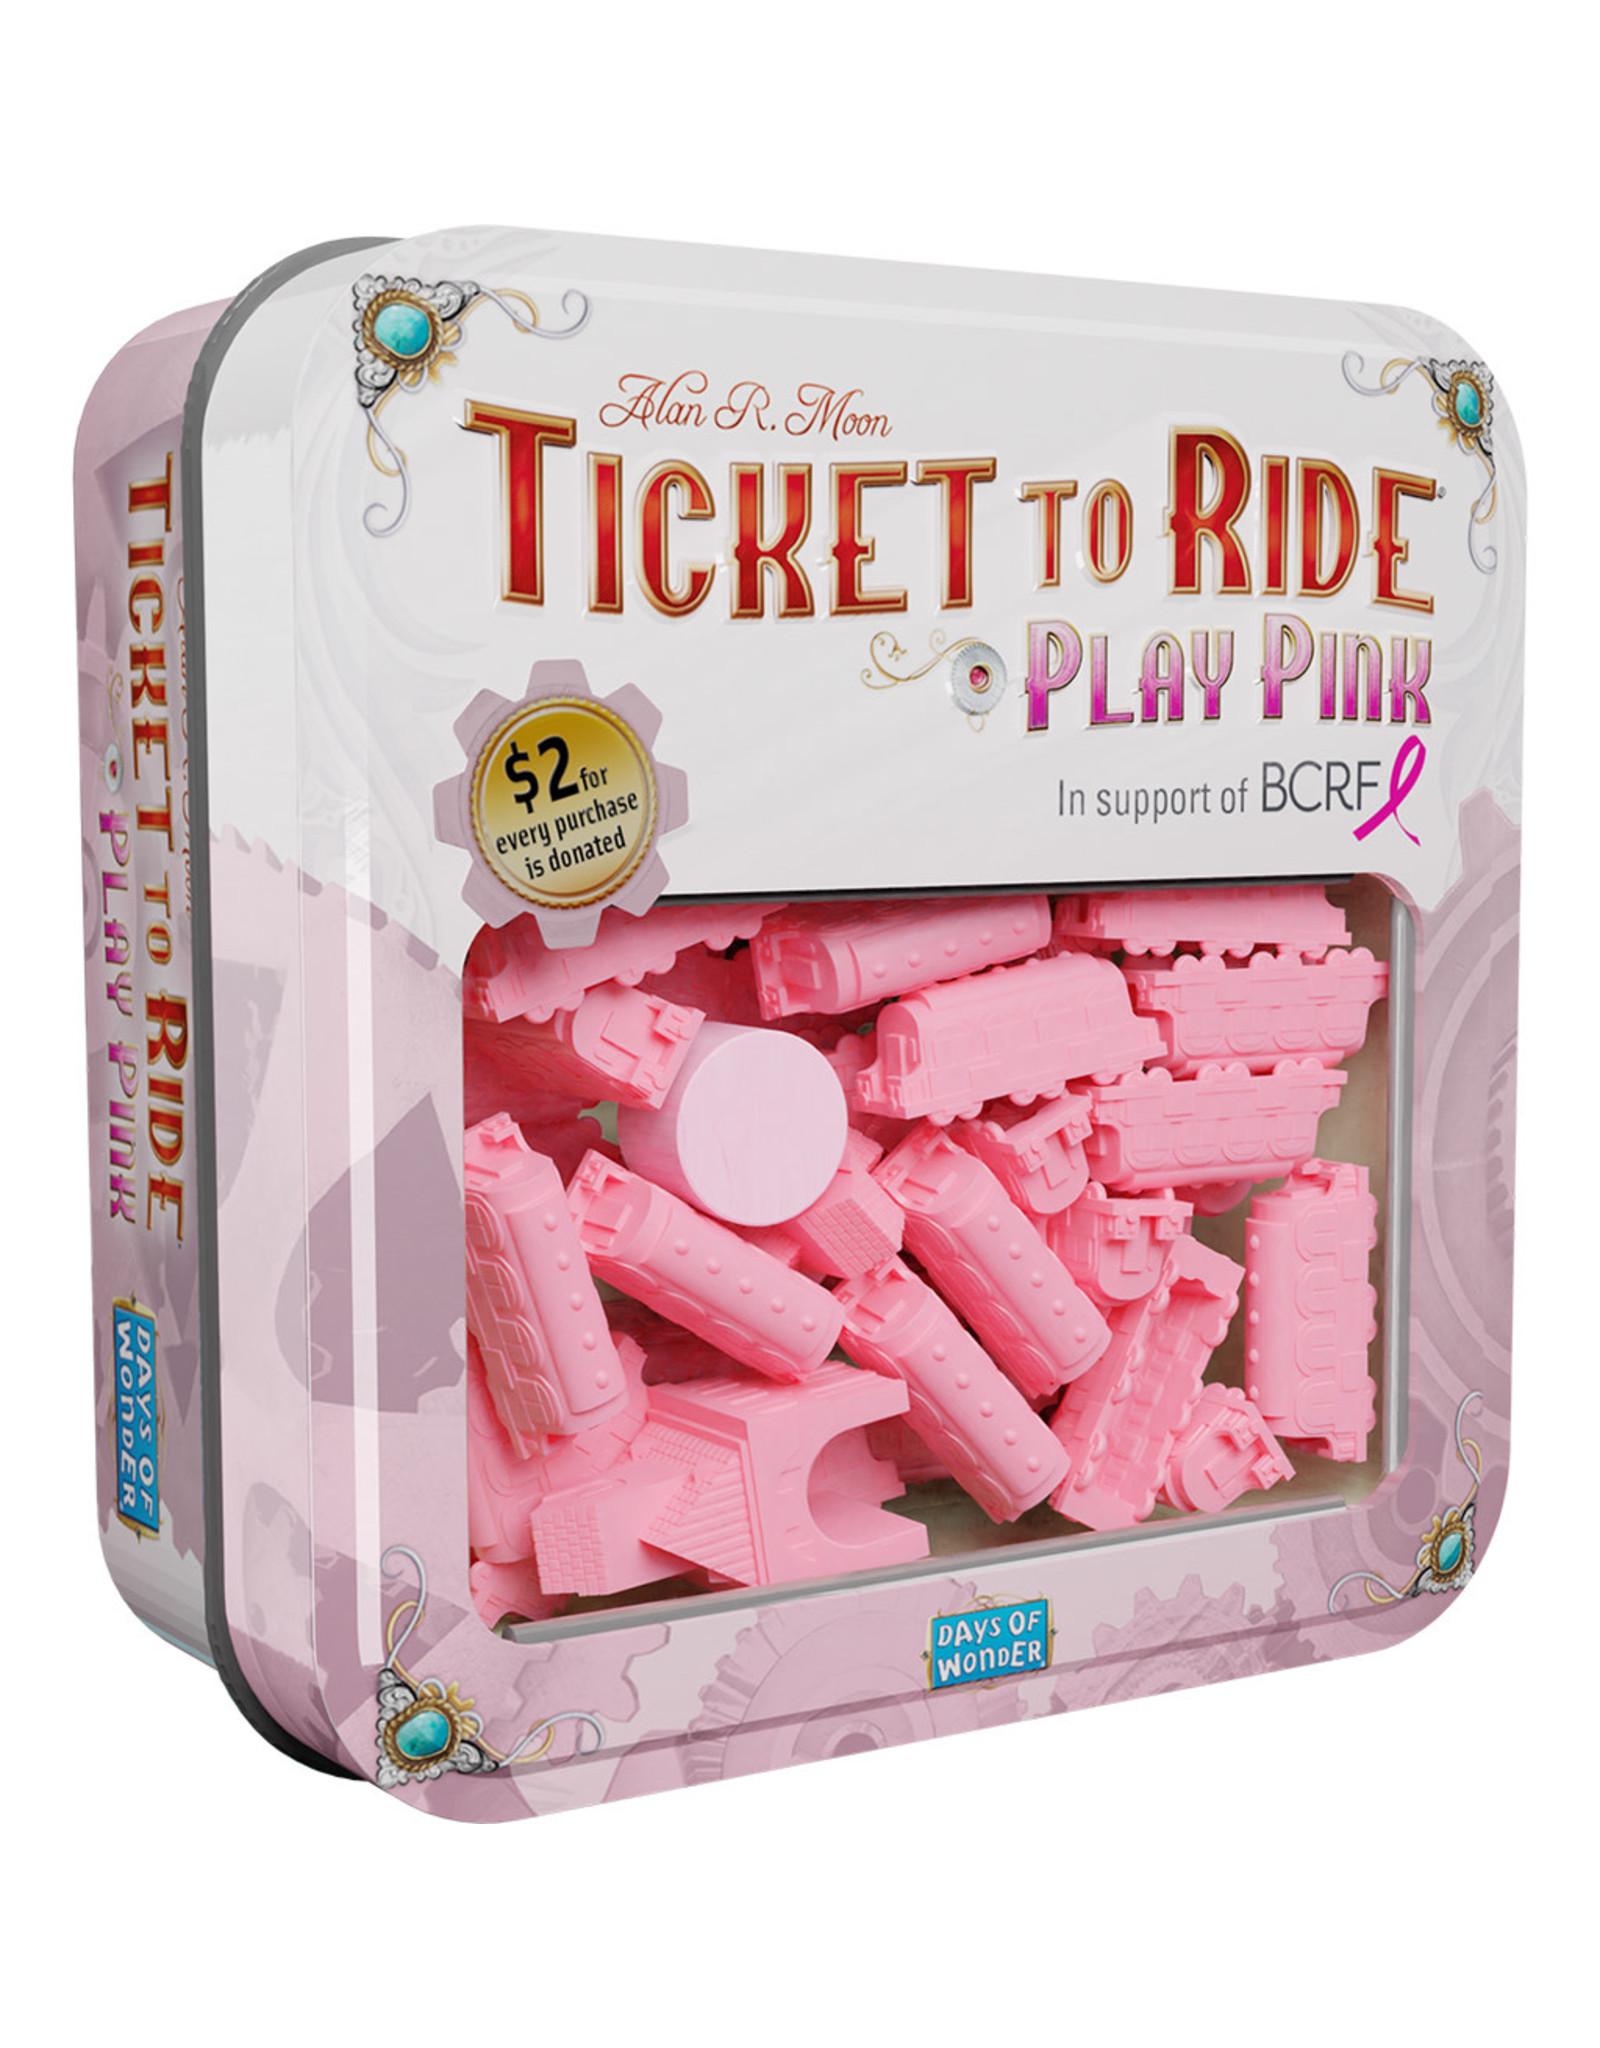 Days of Wonder Ticket to Ride: Play Pink